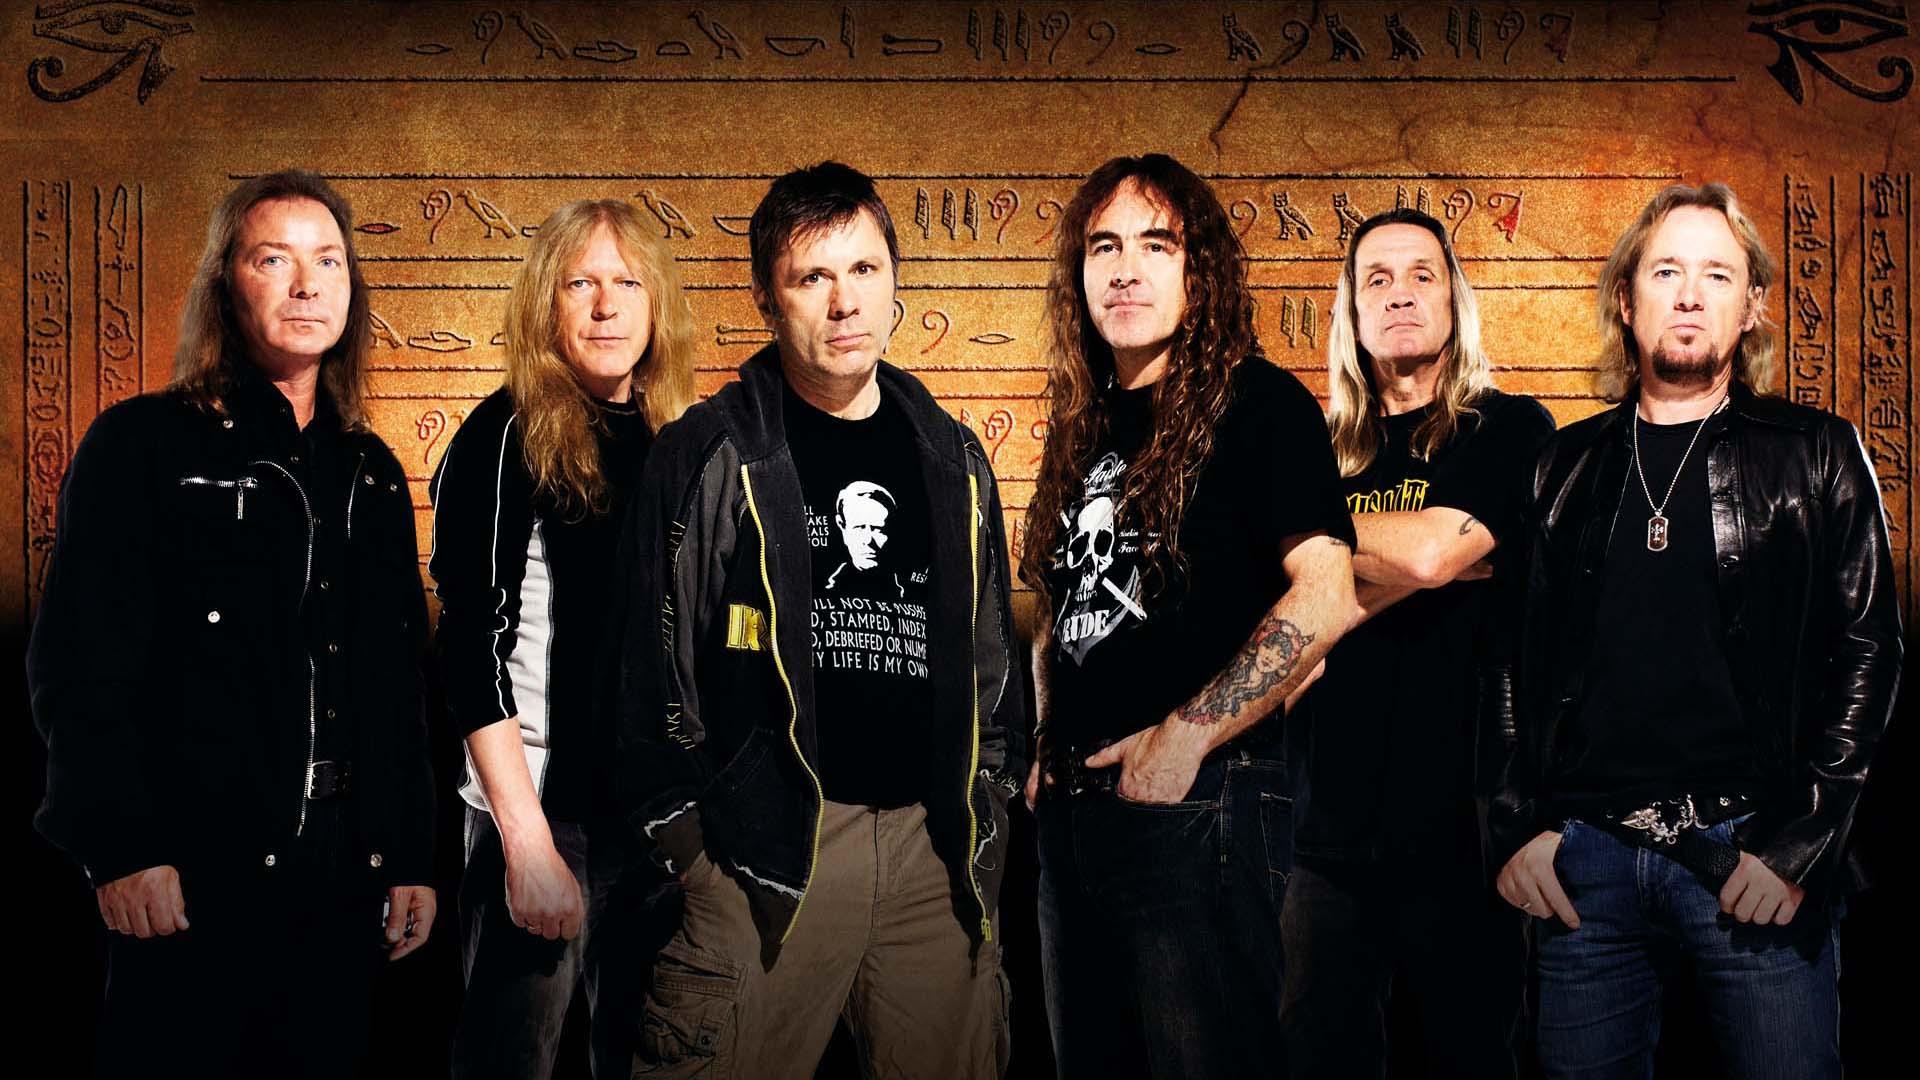 Iron Maiden también actuará en Sevilla en su gira mundial de 2016